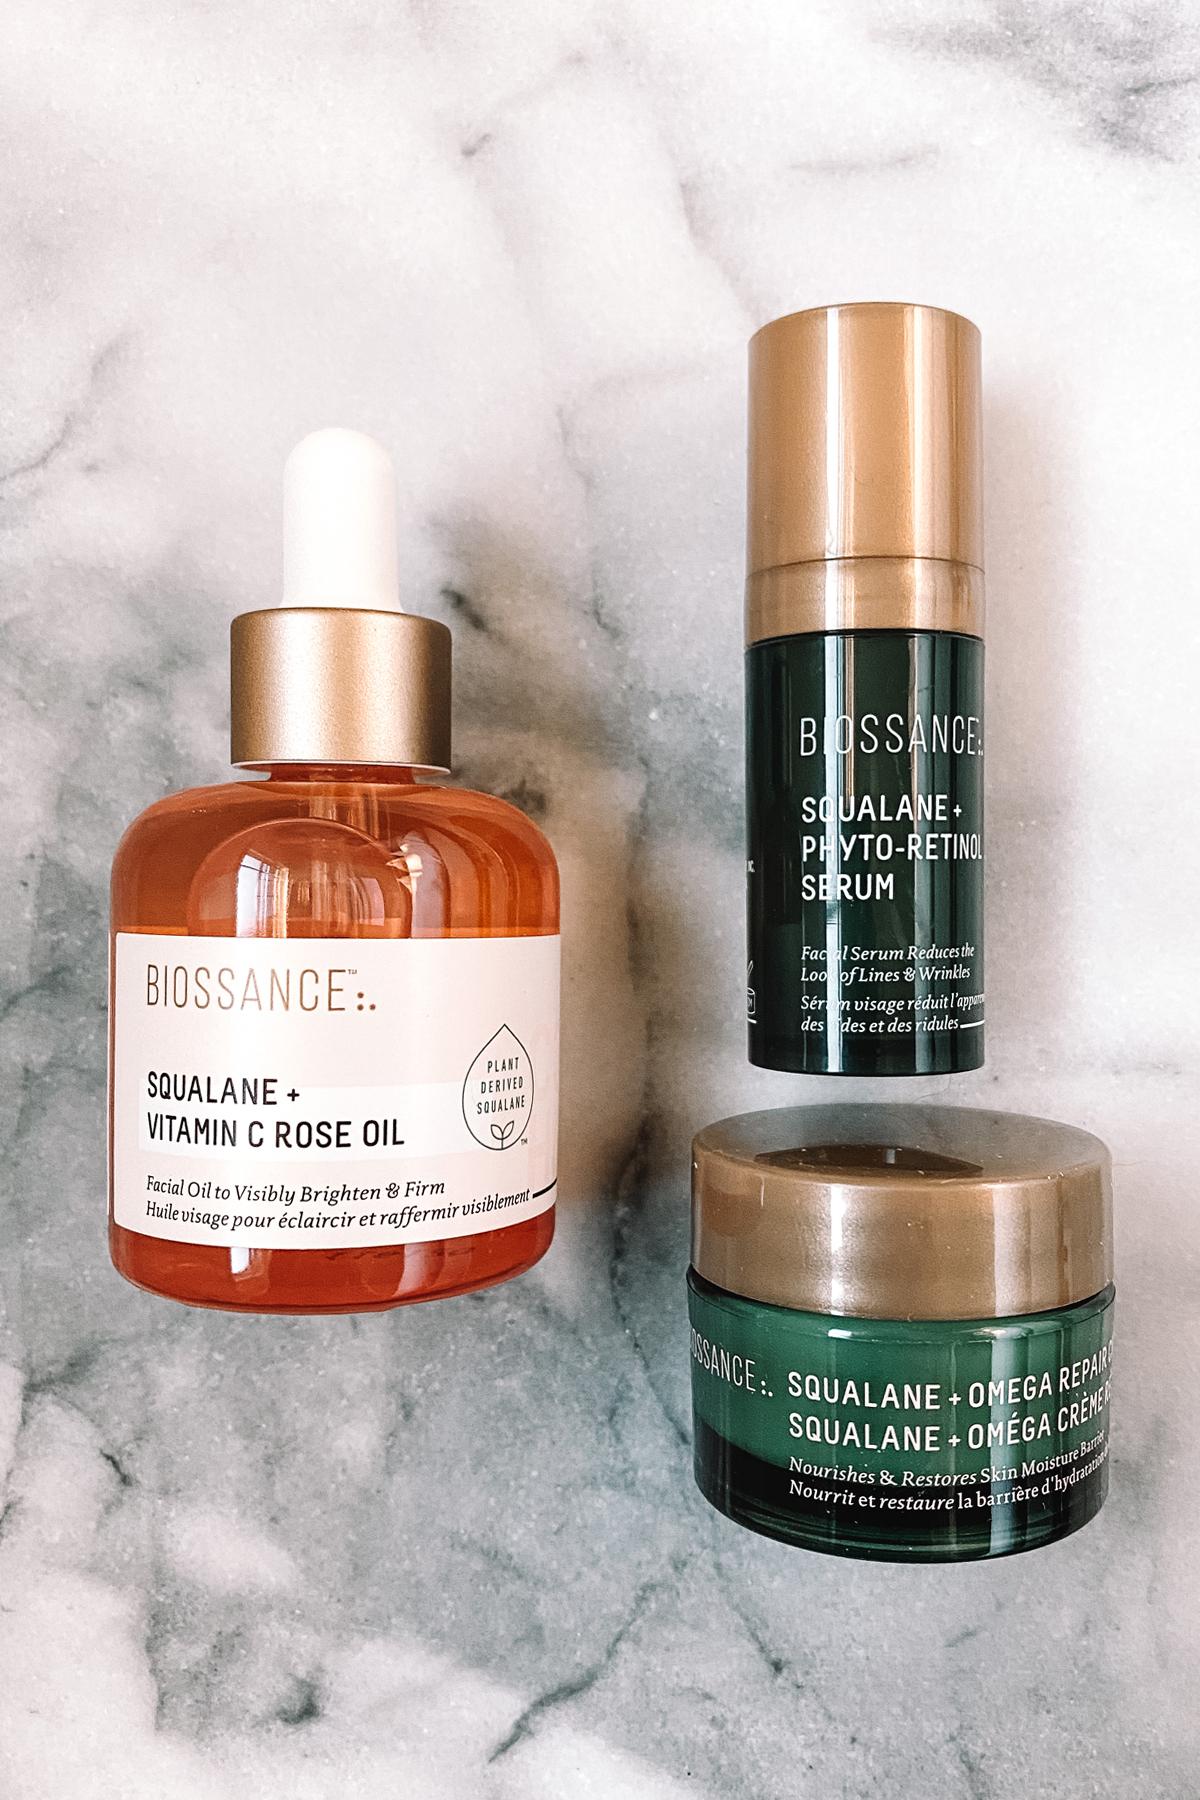 Fashion Jackson Sephora Biossance Skincare